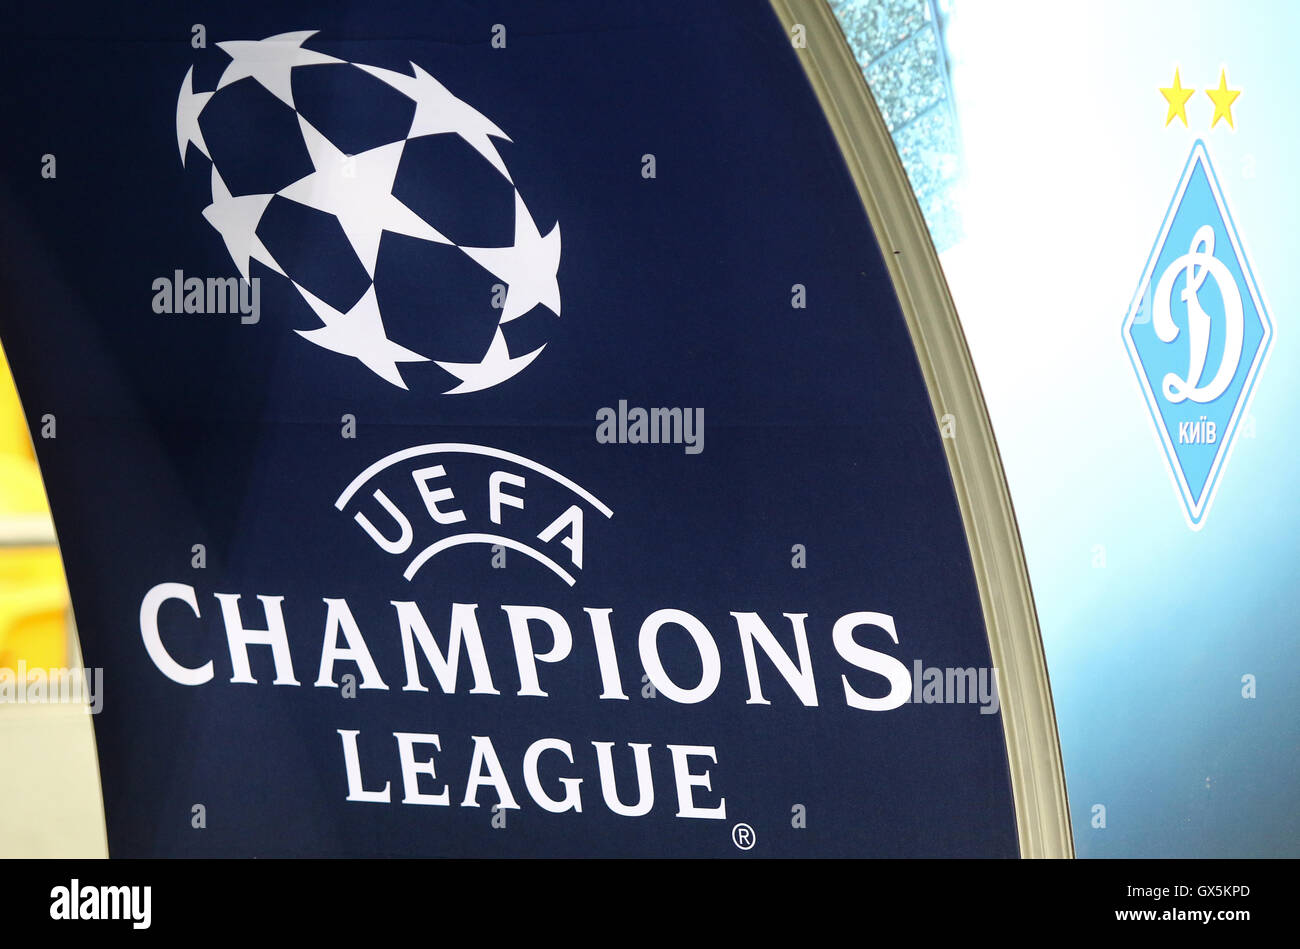 Champions League Logo Stock Photos & Champions League Logo